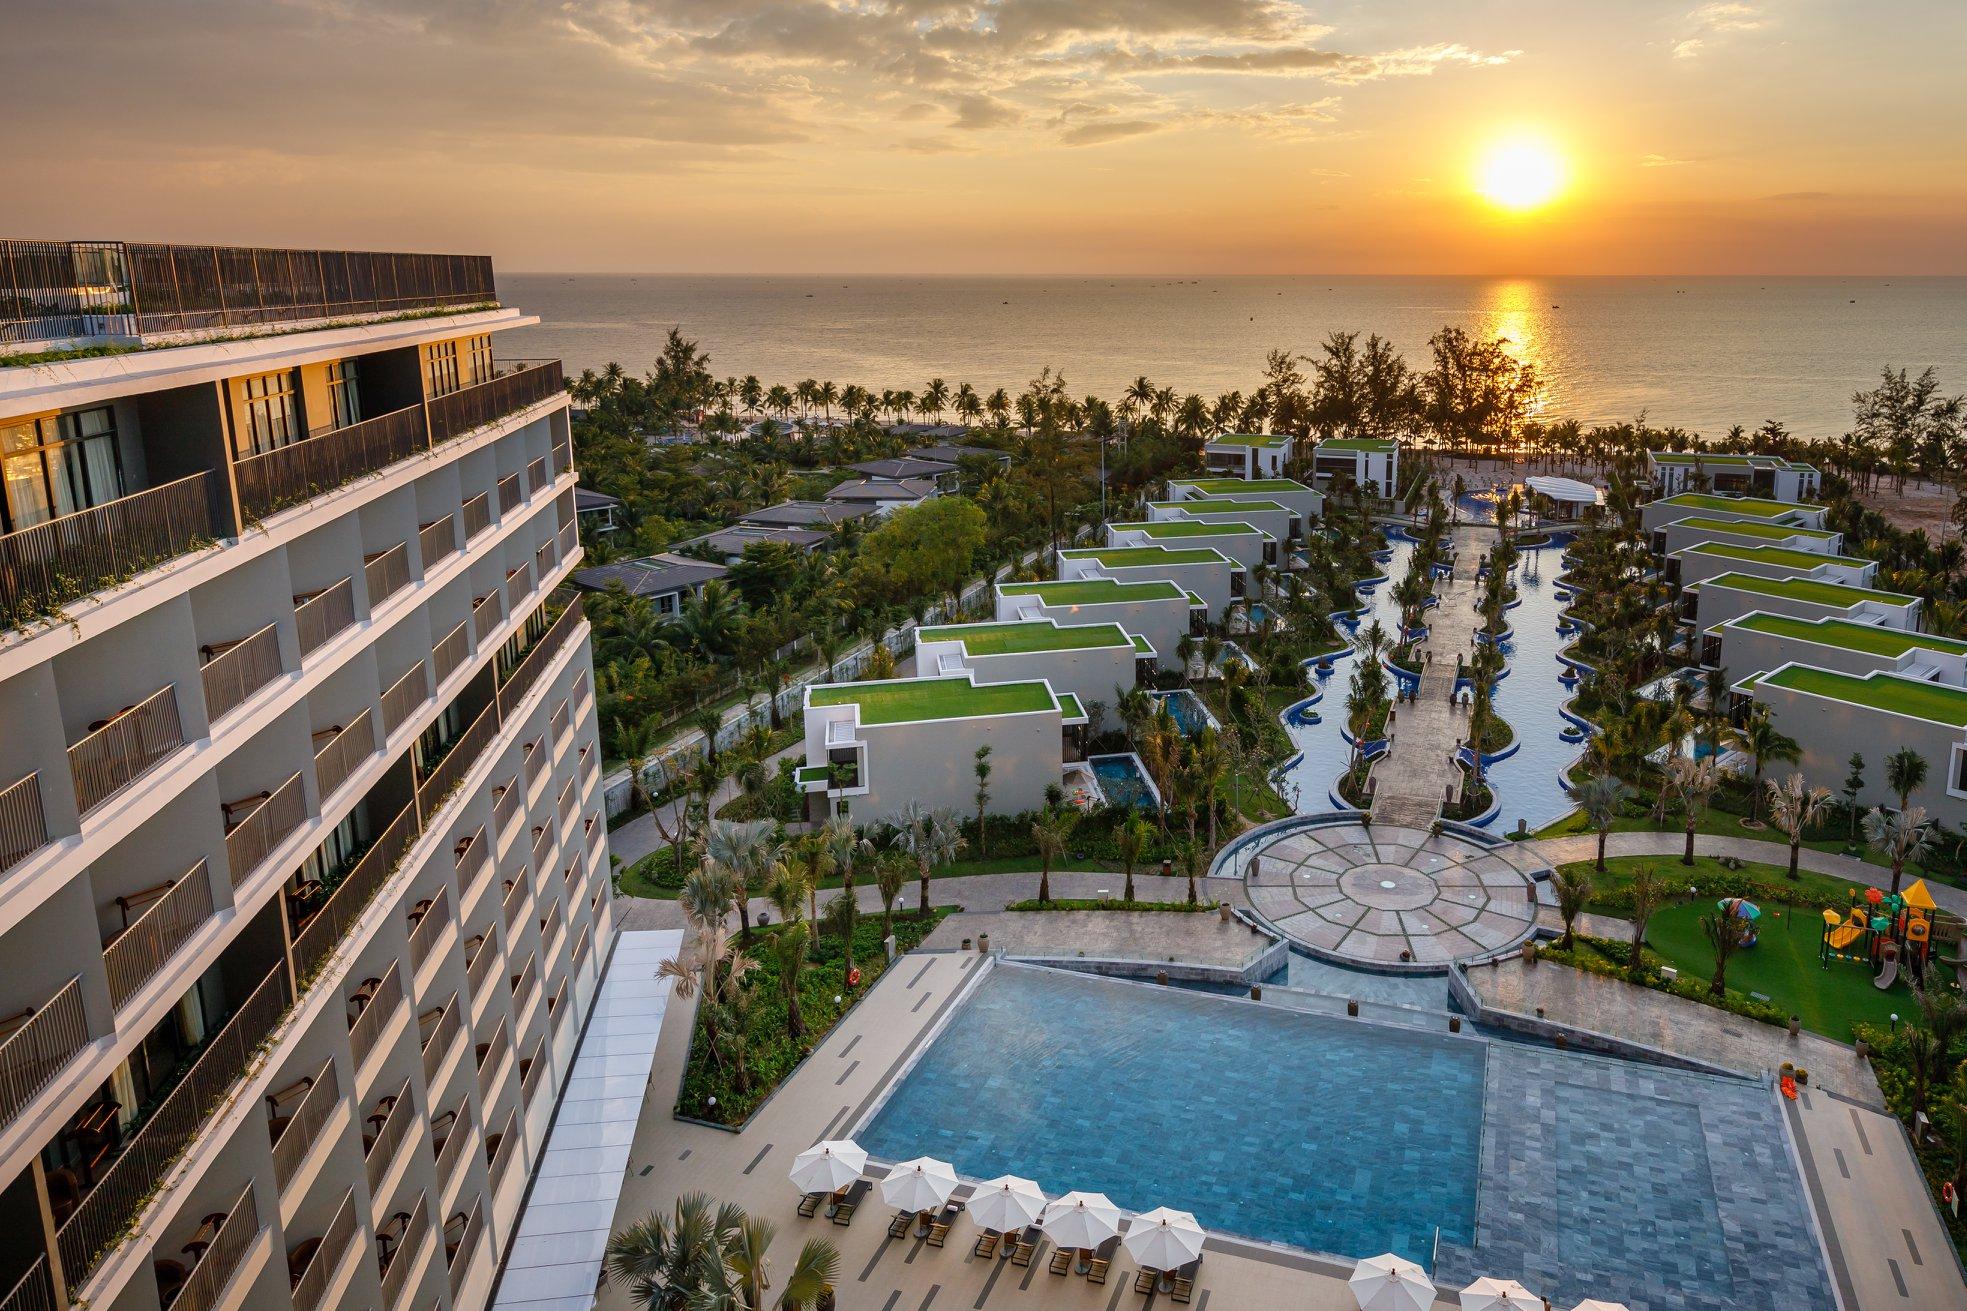 top-resort-phu-quoc-ngam-hoang-hon-dep-nhat-16